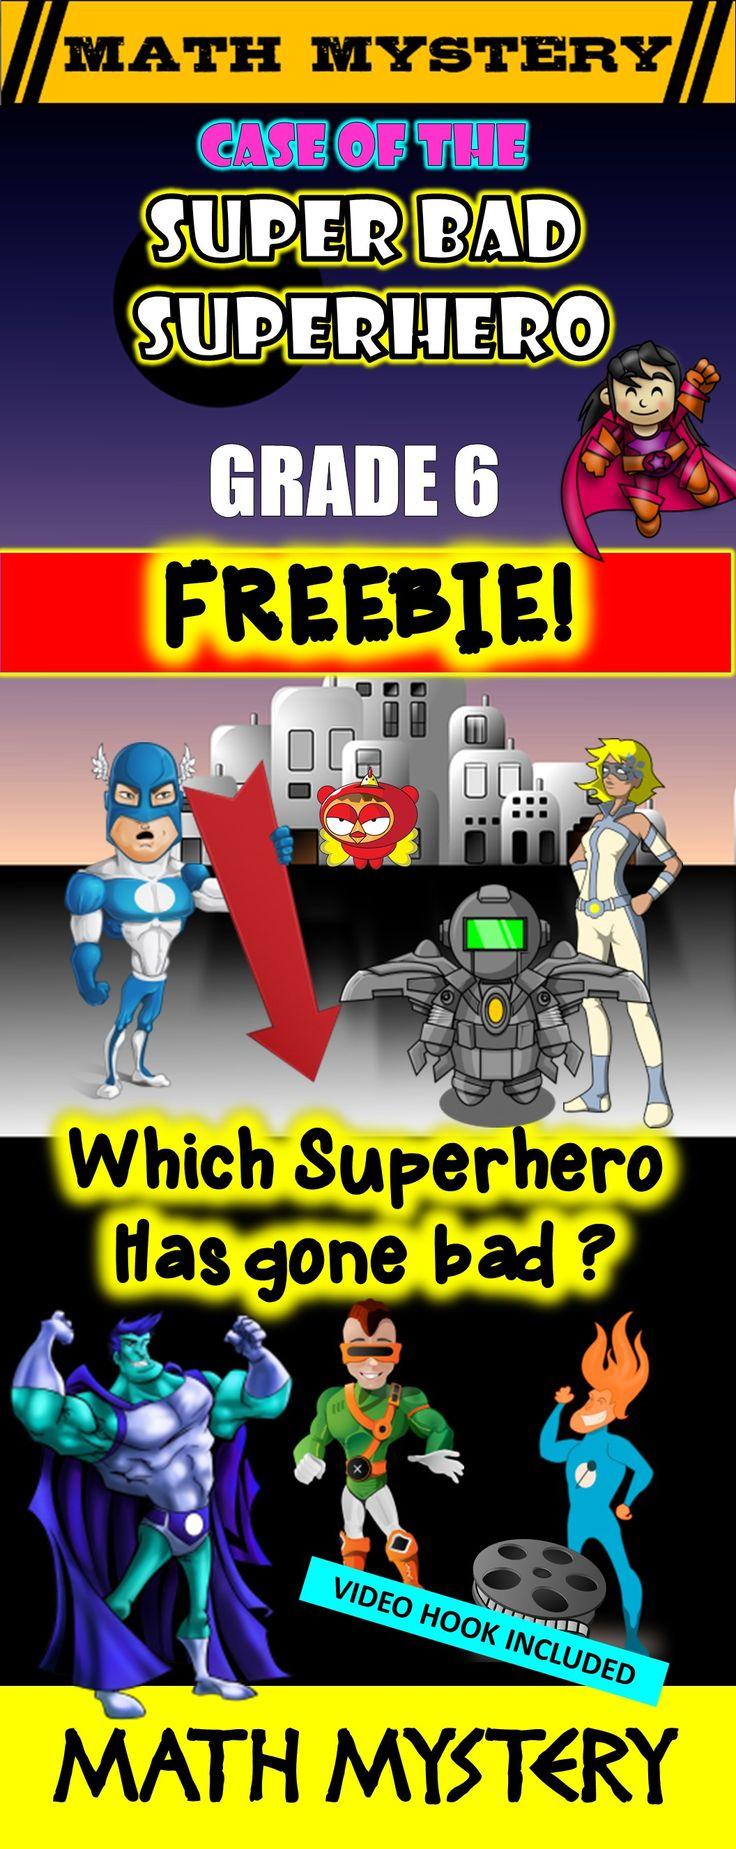 Math Mystery FREEBIE! Case of The Super Bad Superhero! GRADE 6 Version. Fun math review activity!